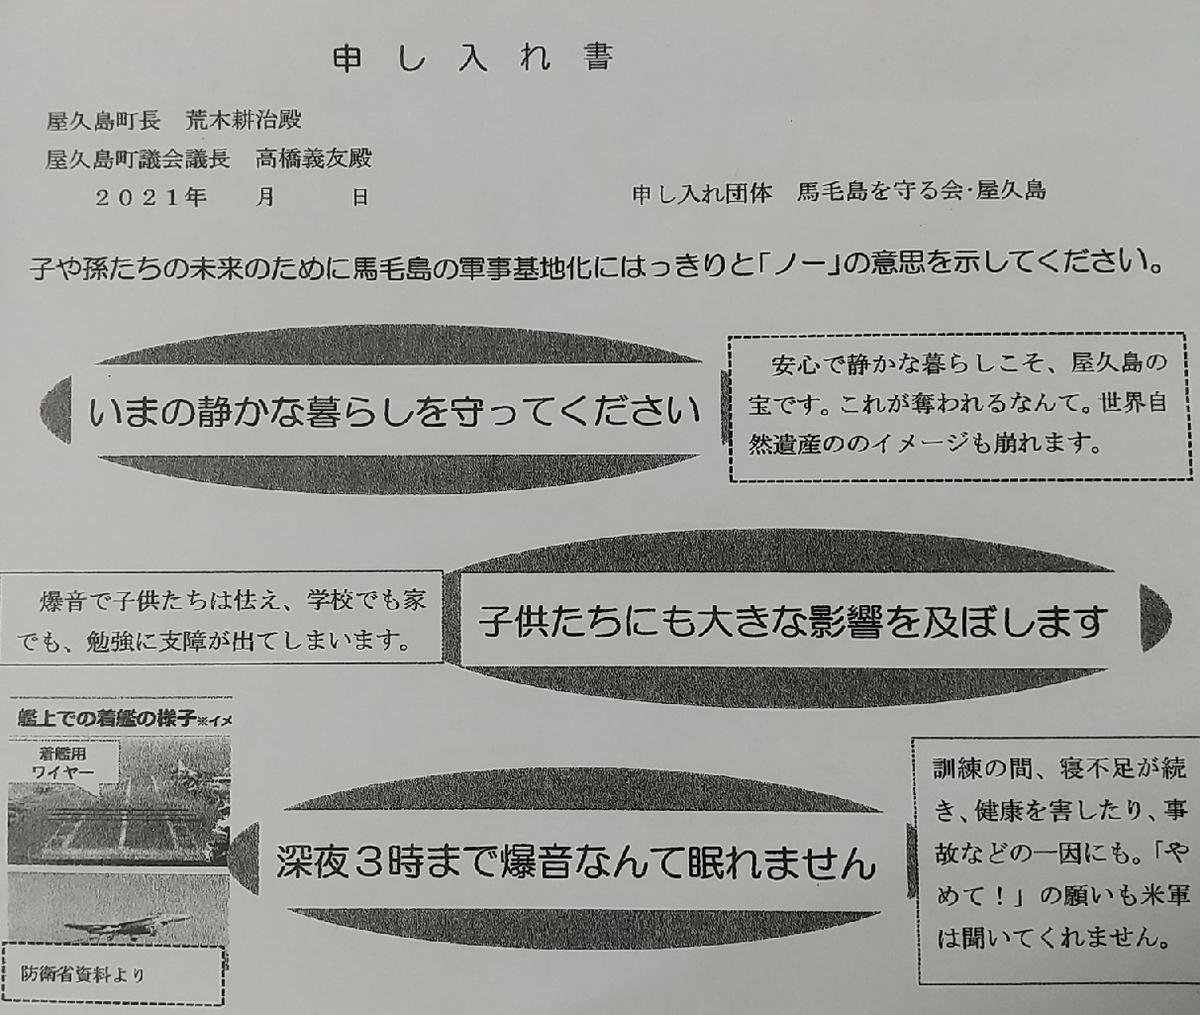 f:id:y-6kakudo:20201120160255j:plain